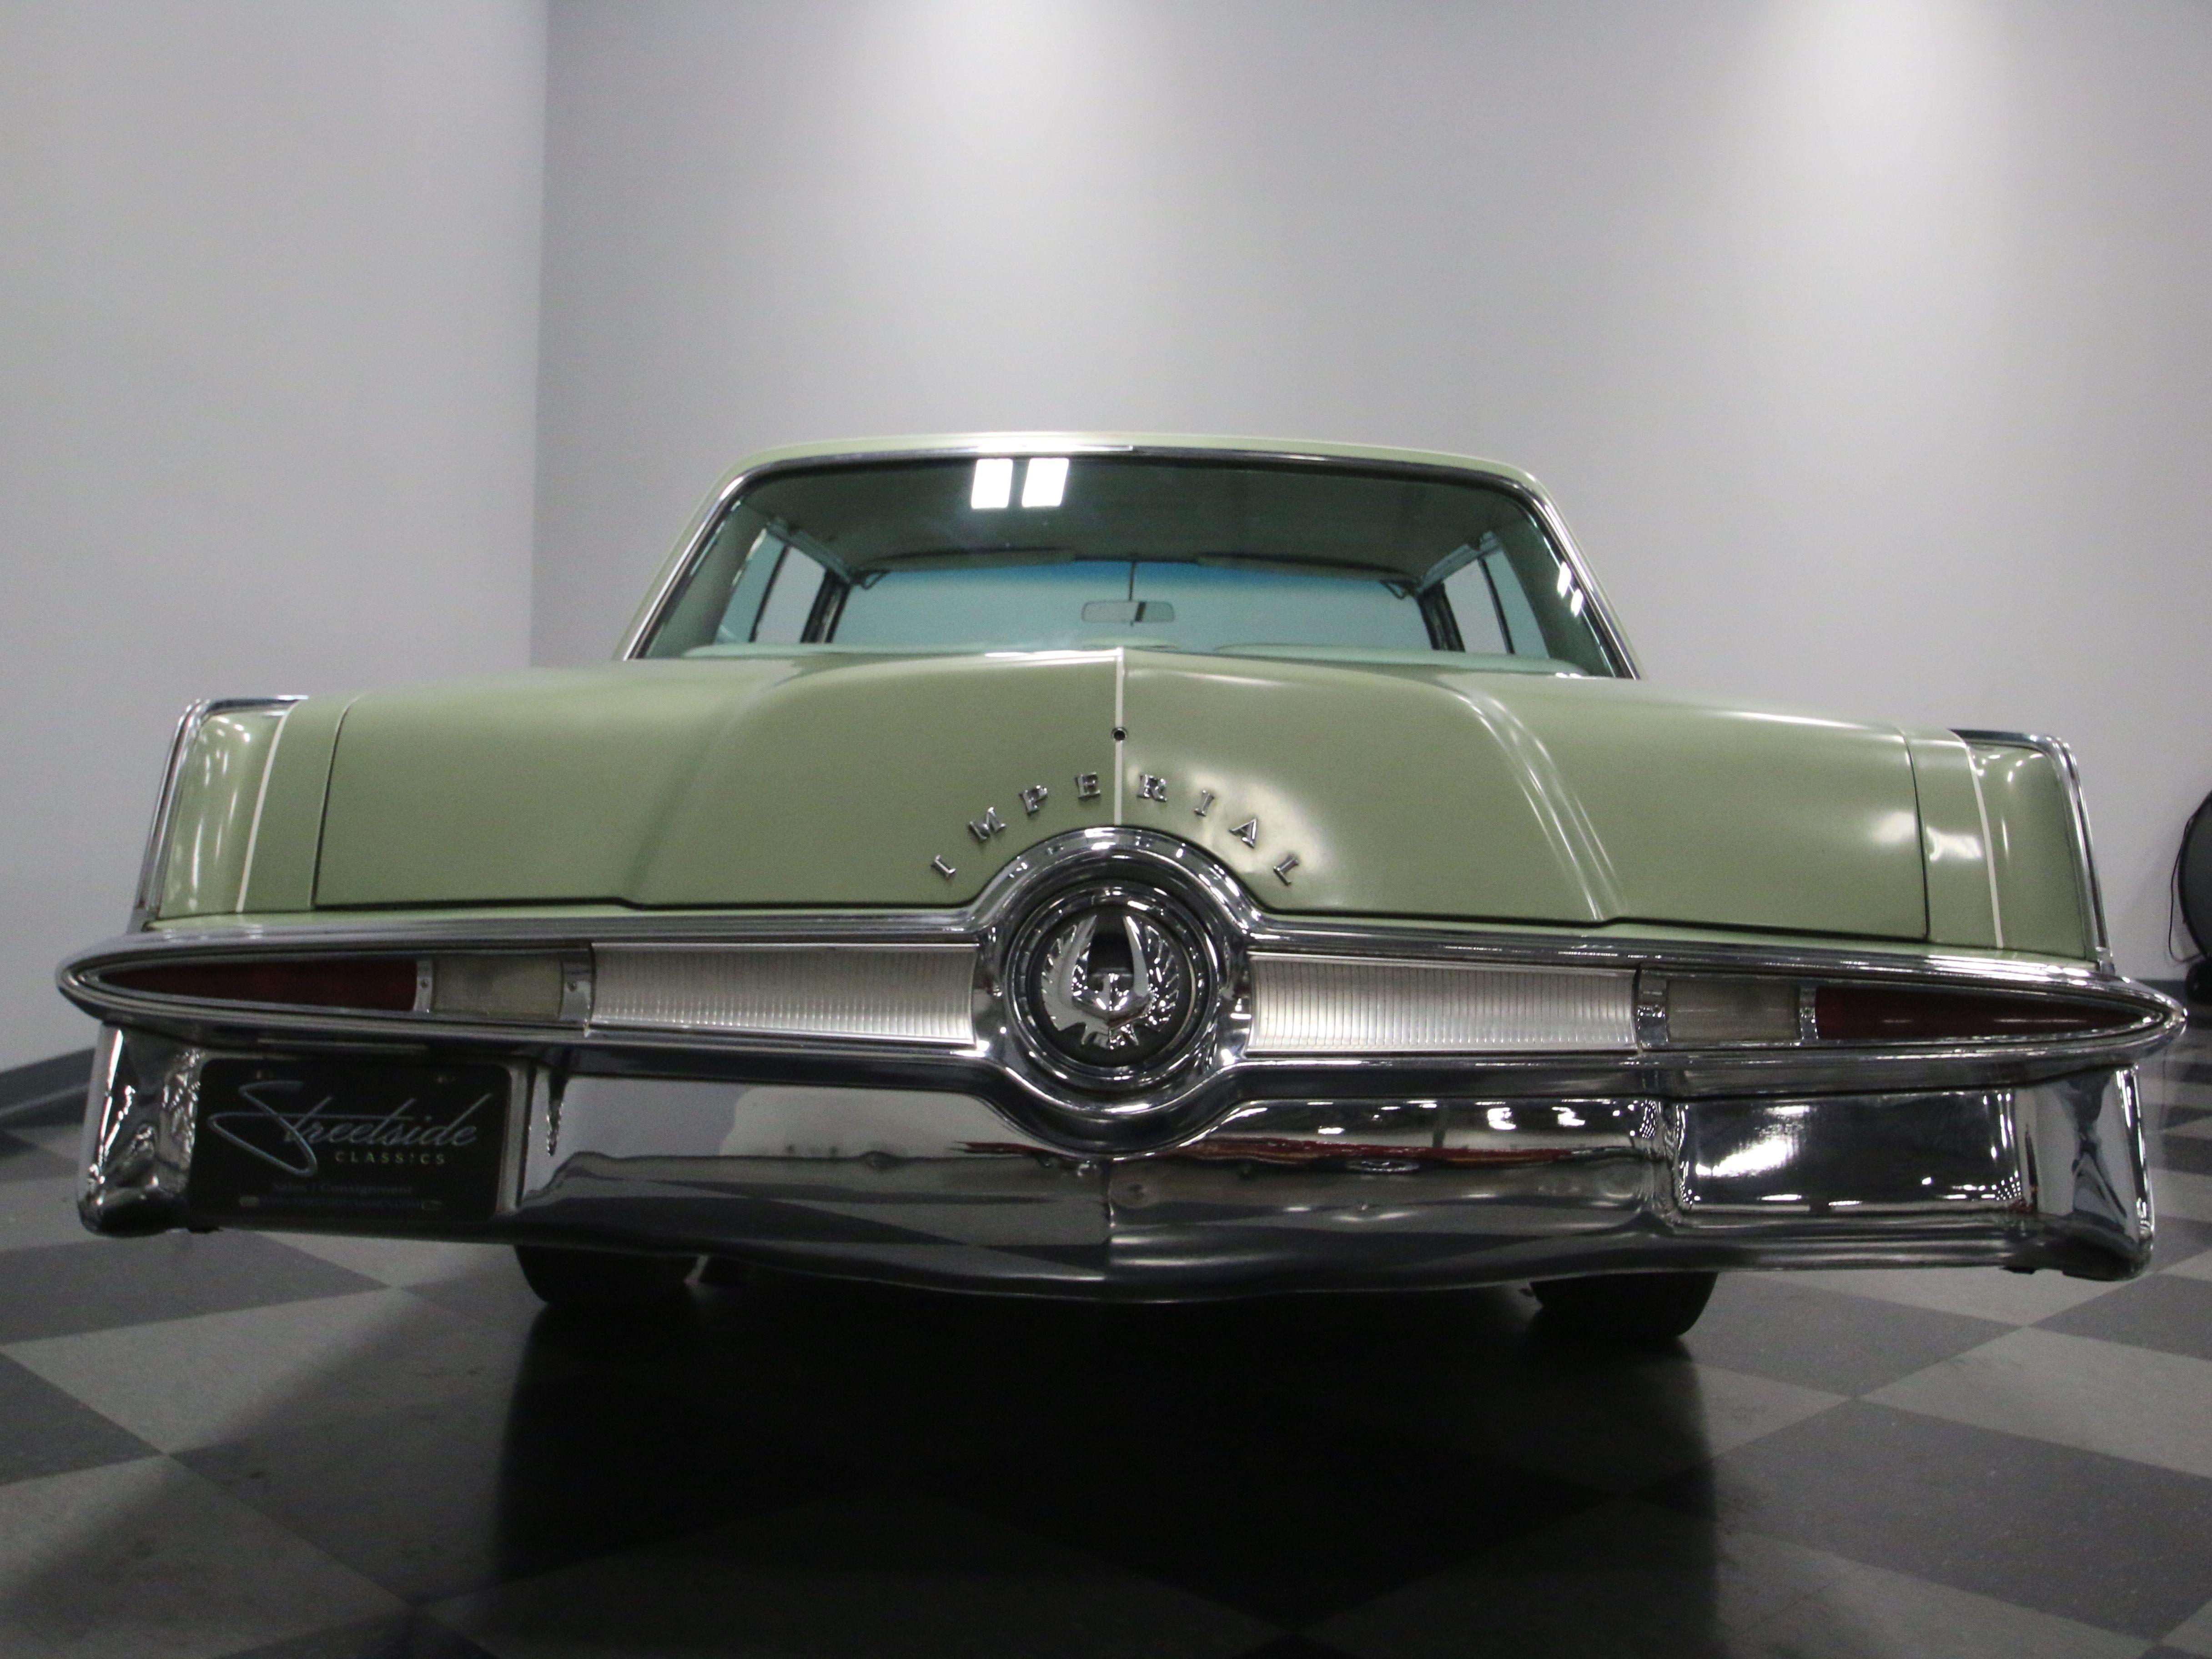 0708-NSH | 1964 Chrysler Imperial Crown | Streetside Classics | Car ...